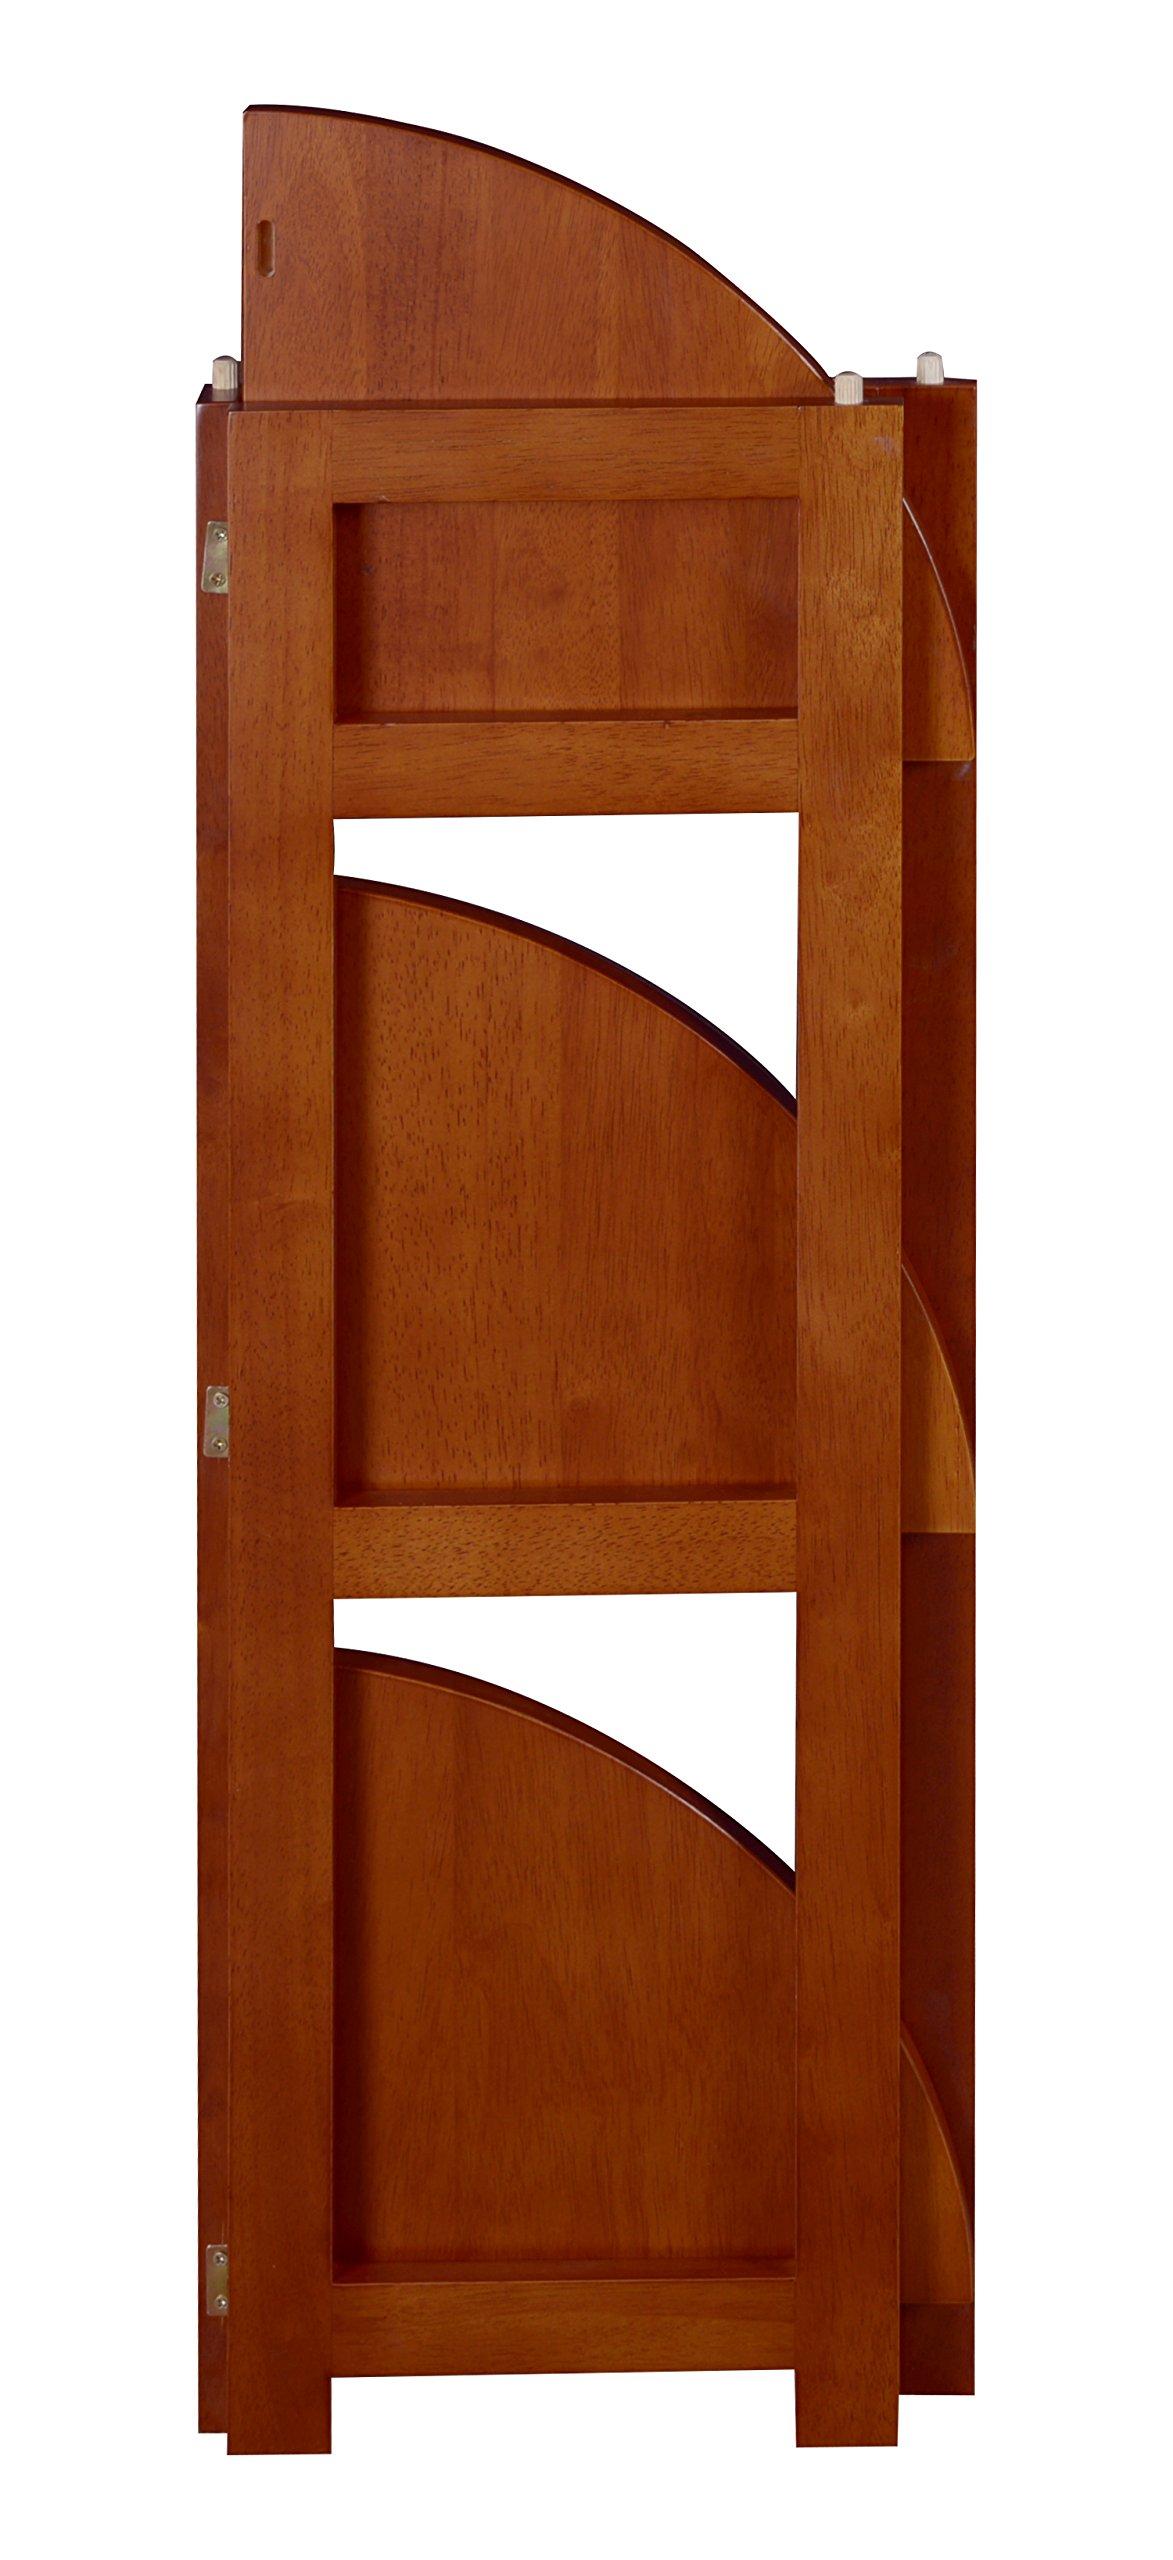 Regency Flip Flop 34-inch High Corner Folding Bookcase- Cherry by Regency (Image #5)